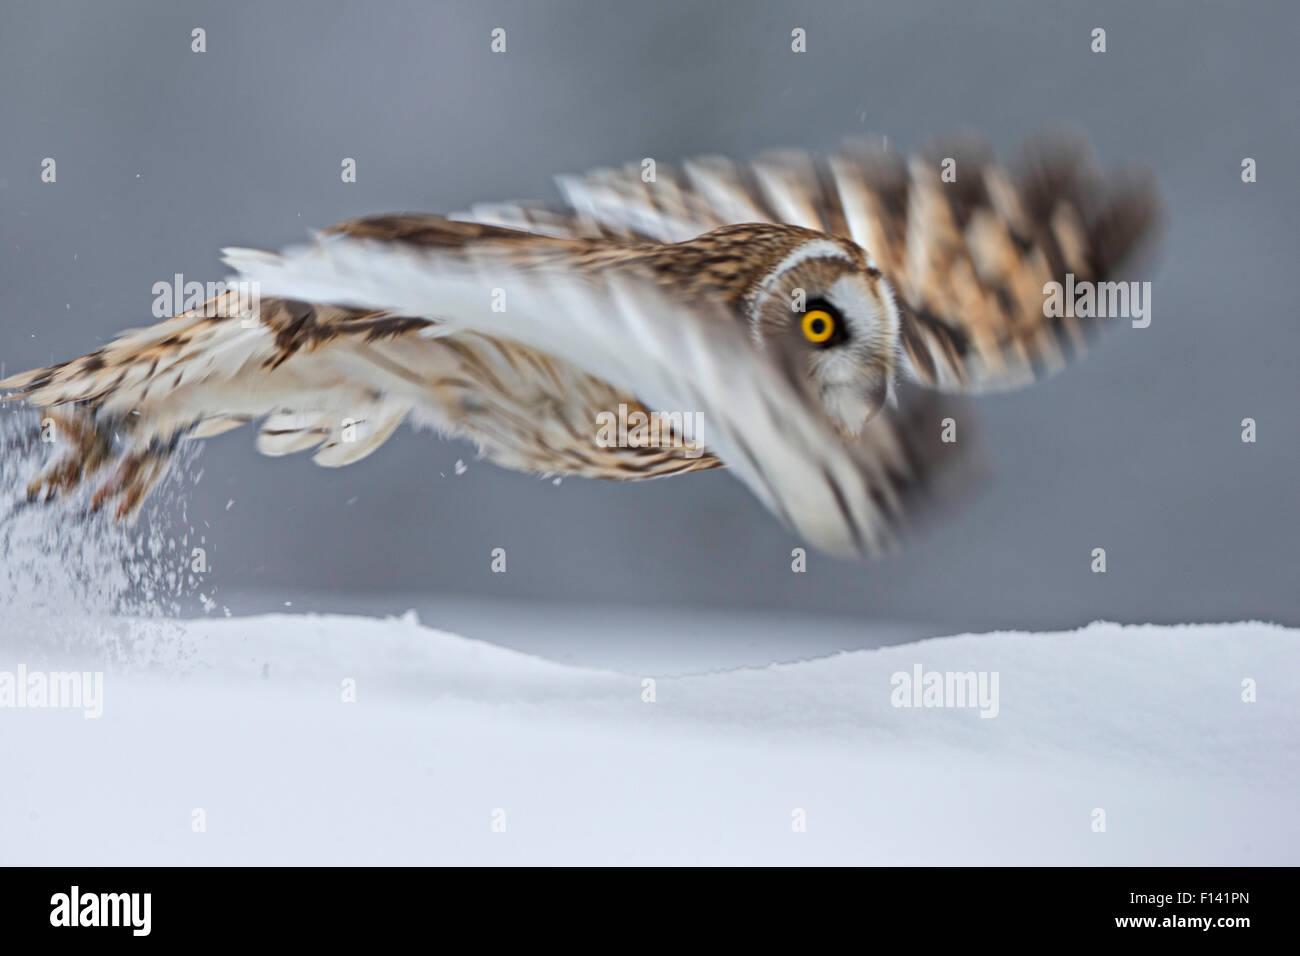 Short Eared Owl (Asio flammeus) taking off, blurred motion photograph, UK, January. Captive - Stock Image